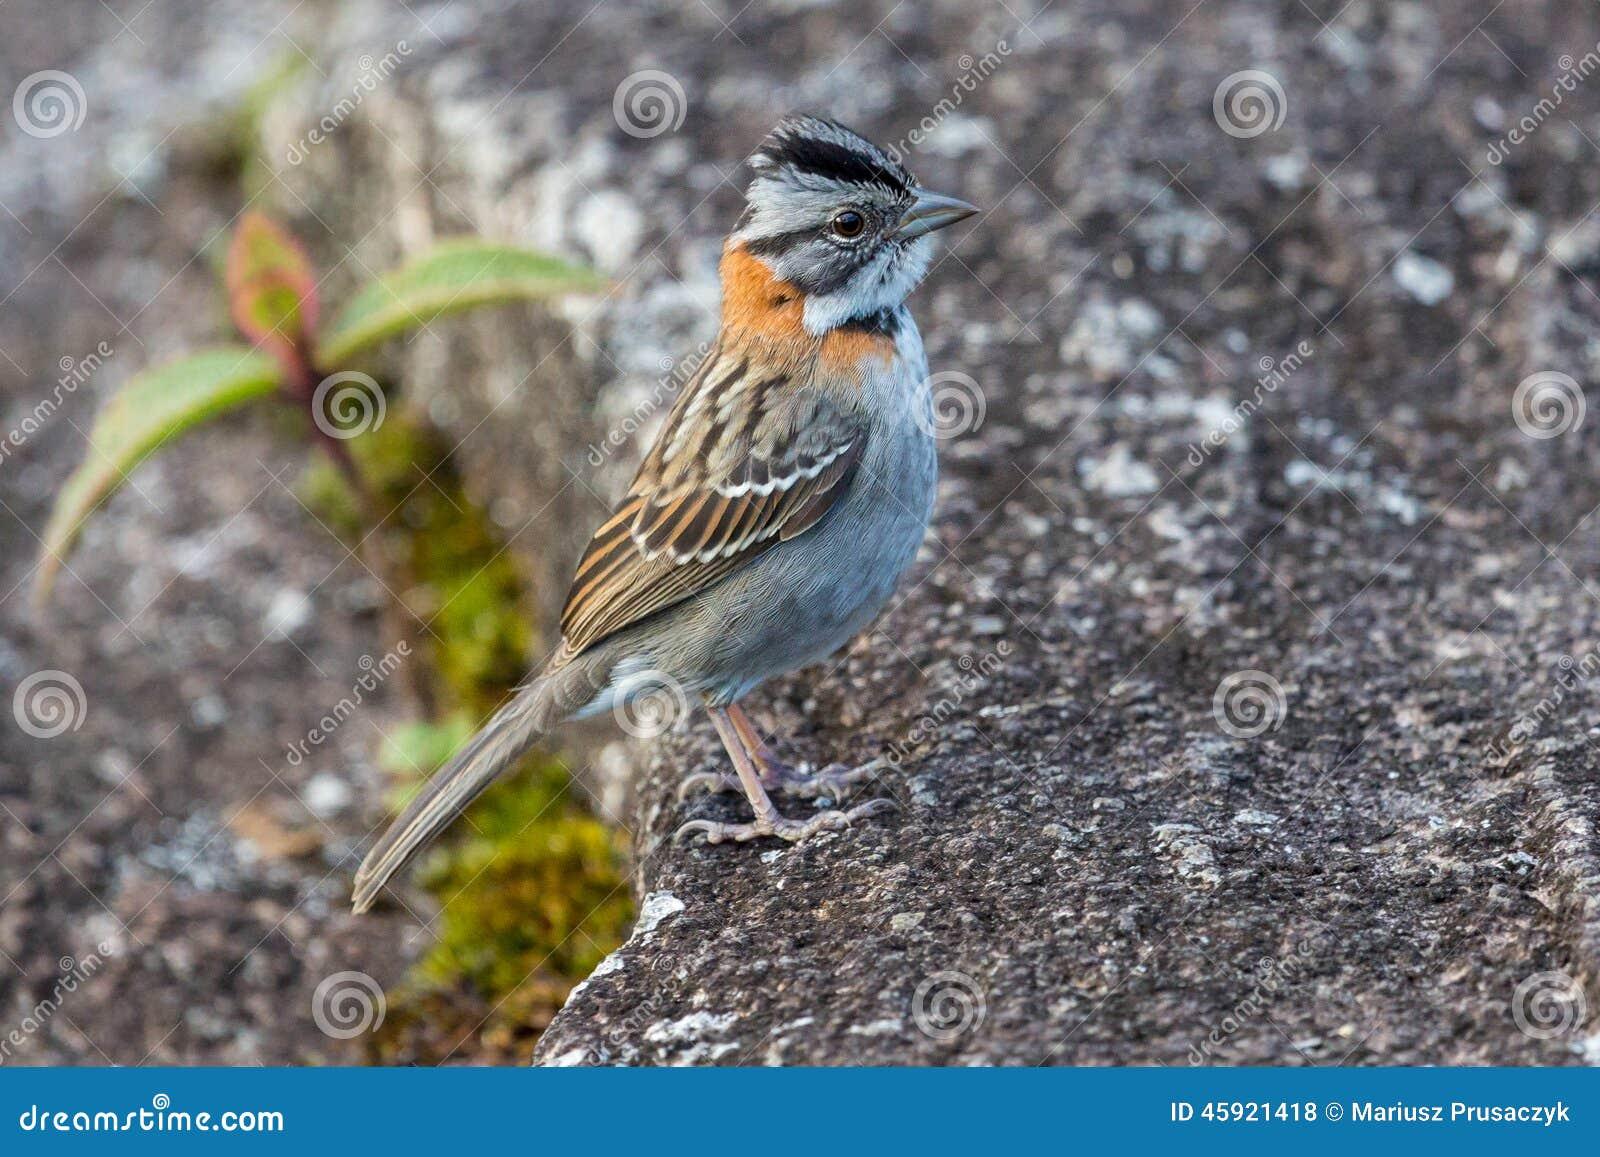 Pequeño pájaro en la meseta del tepui de Roraima - Venezuela, Suramérica